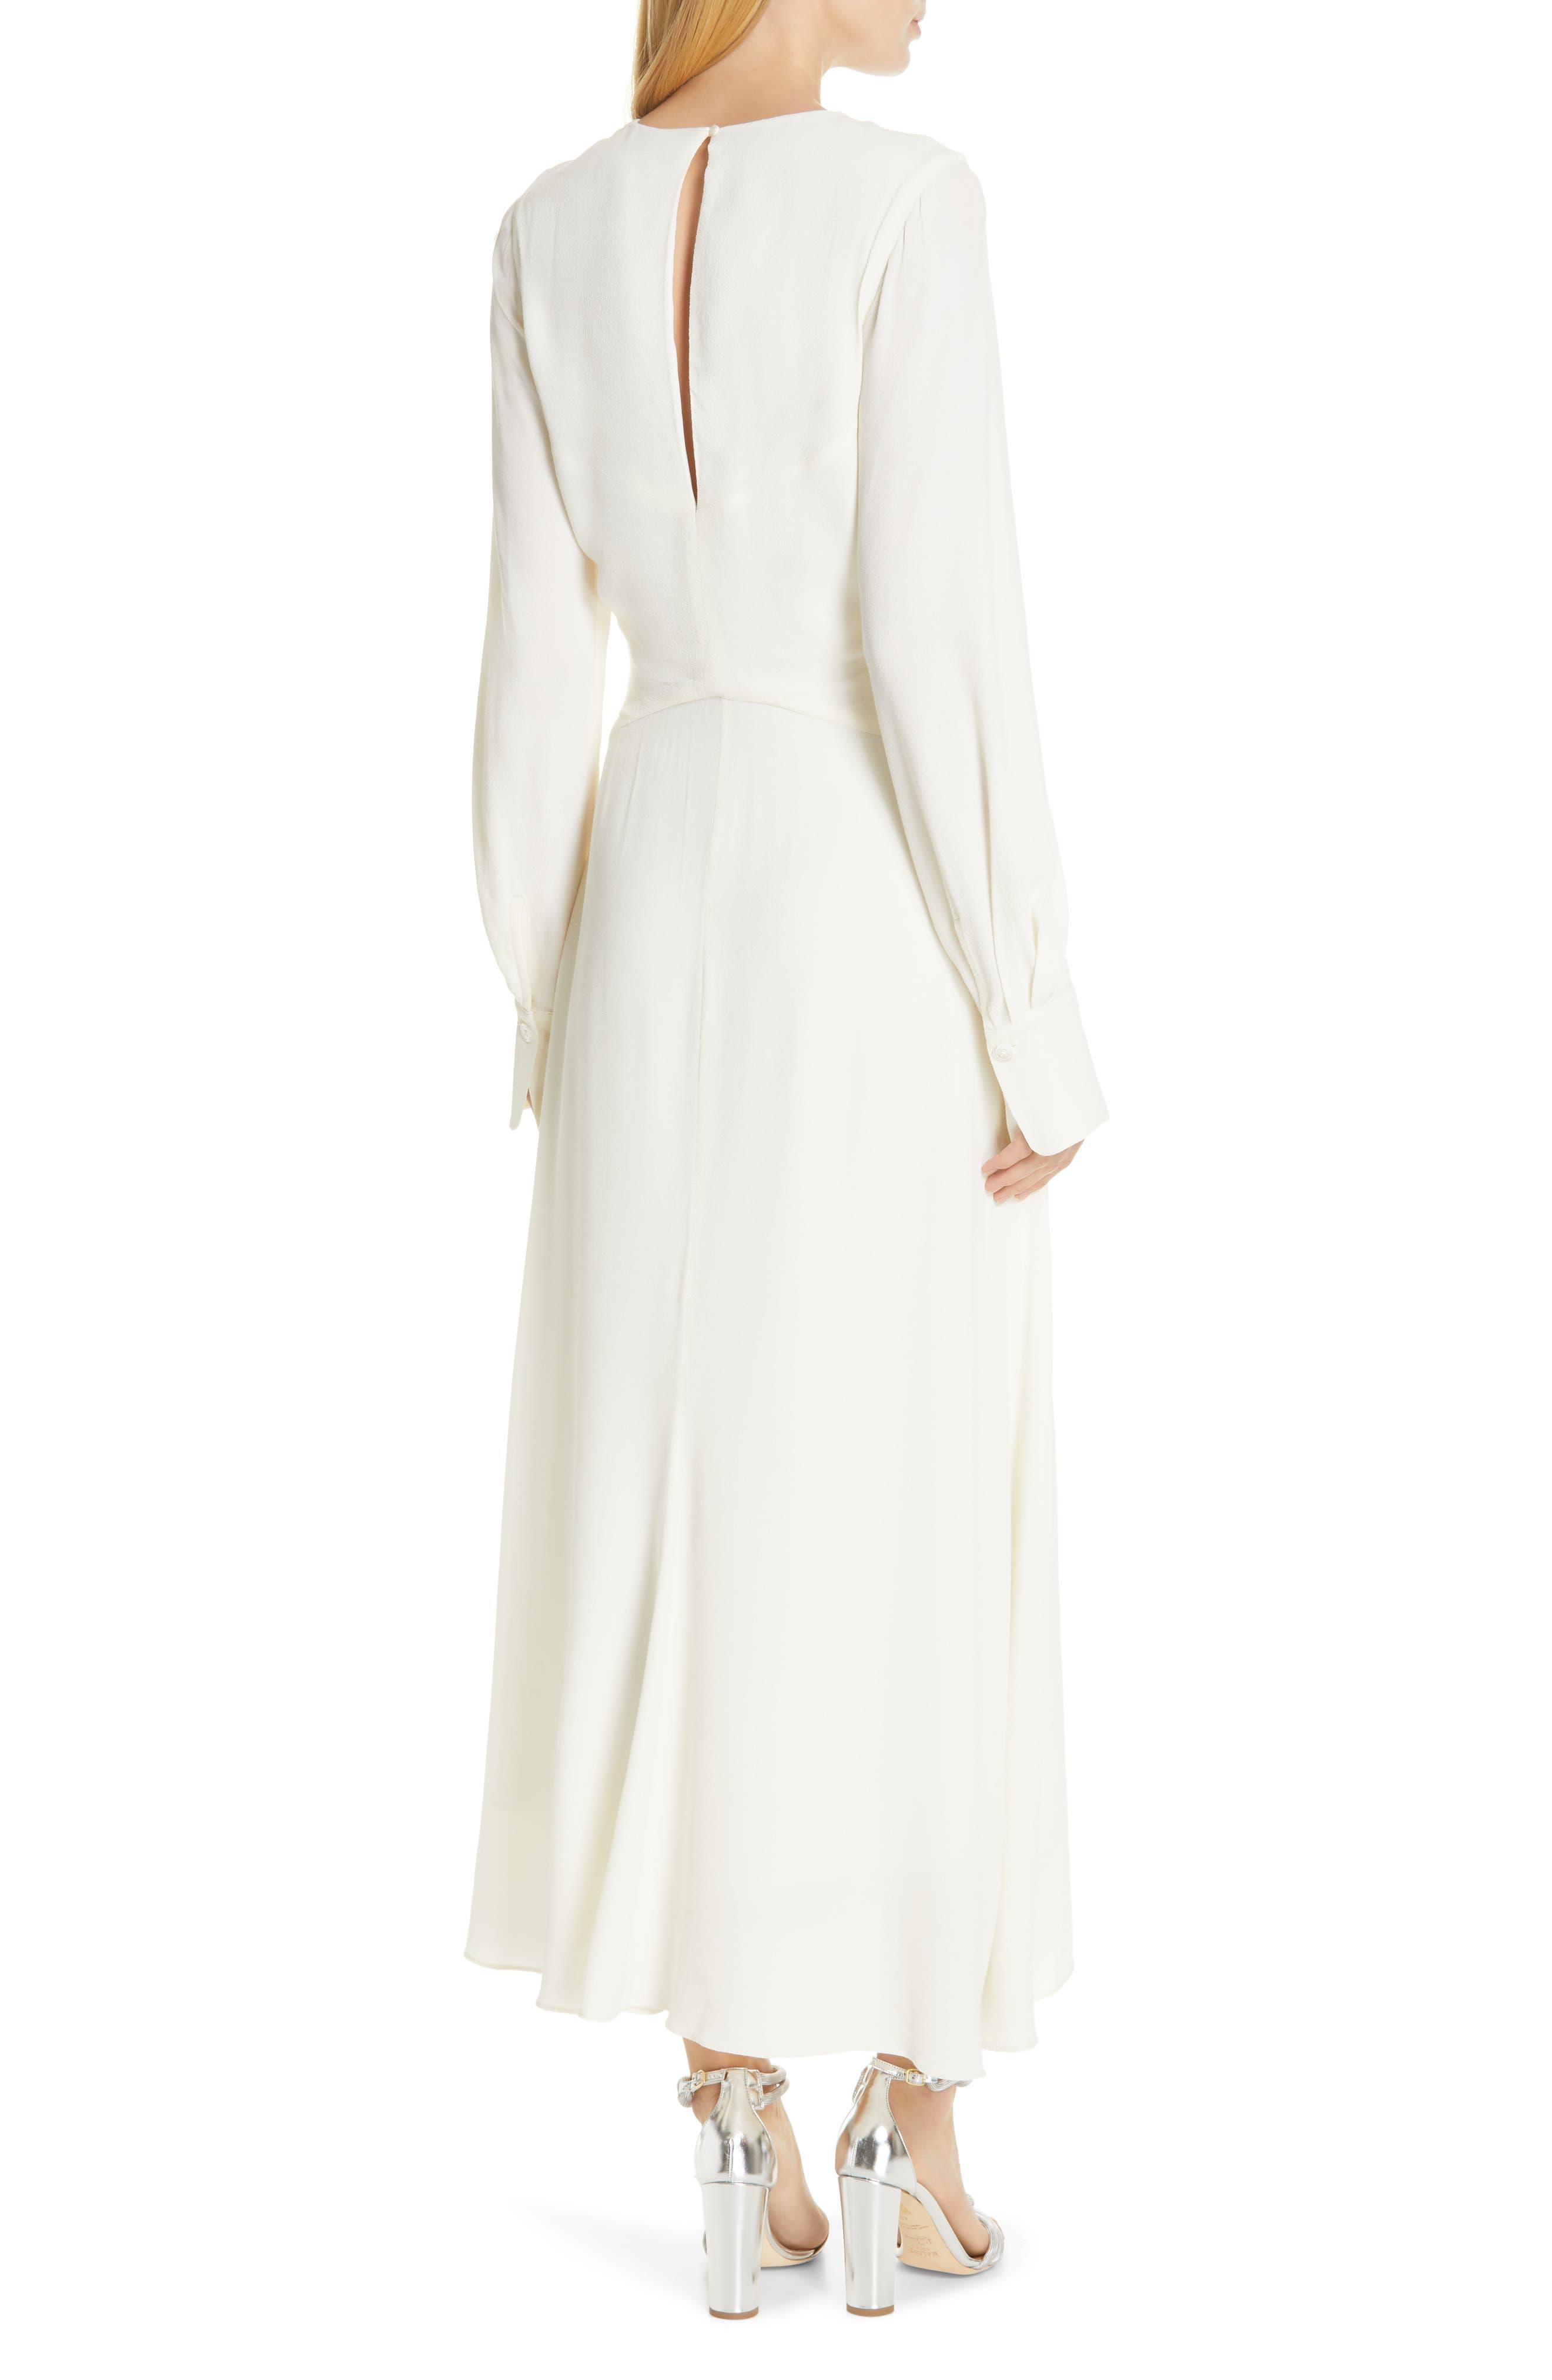 EQUIPMENT, Faun Twist Front Dress, Alternate thumbnail 2, color, NATURE WHITE